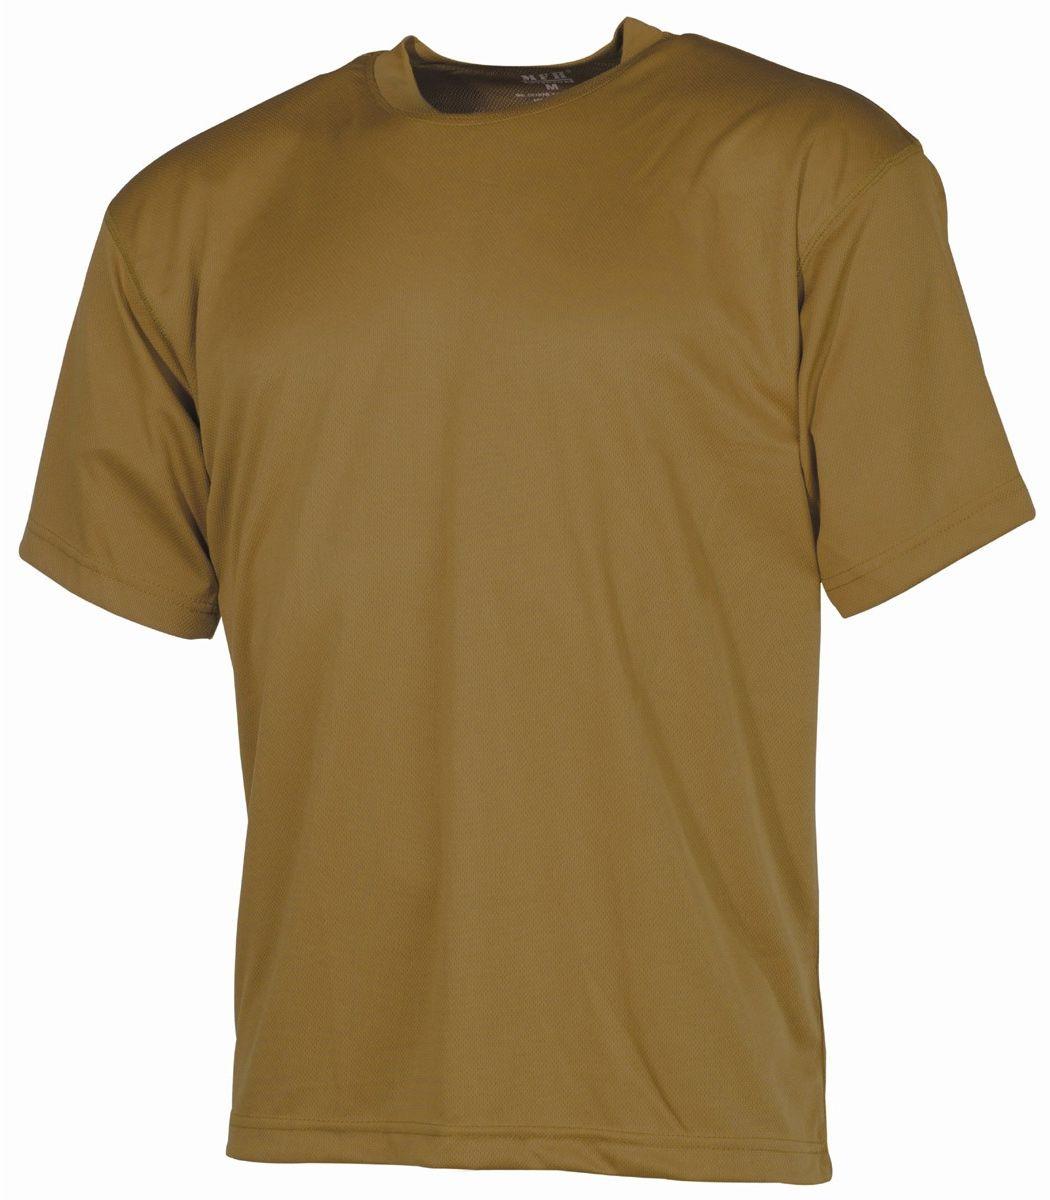 Koszulka T-shirt MFH Tactical Coyote Tan (00107R)